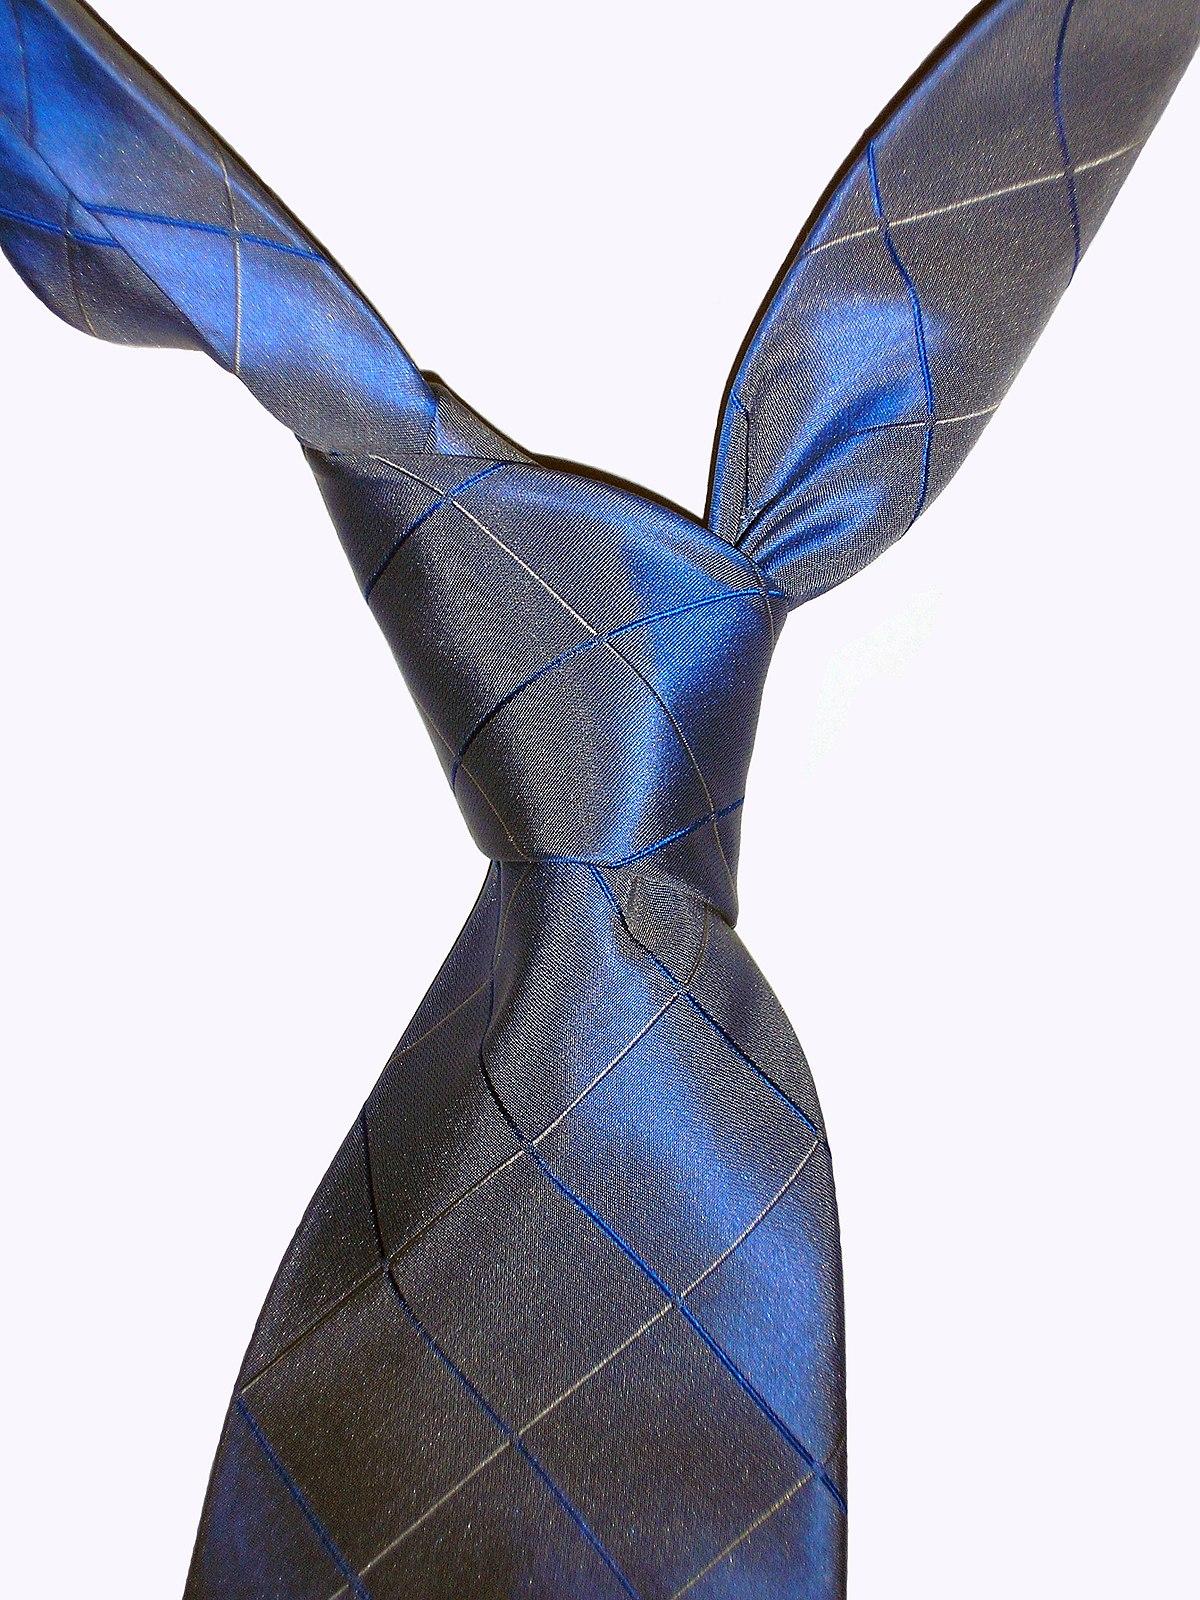 fourinhand knot wikipedia